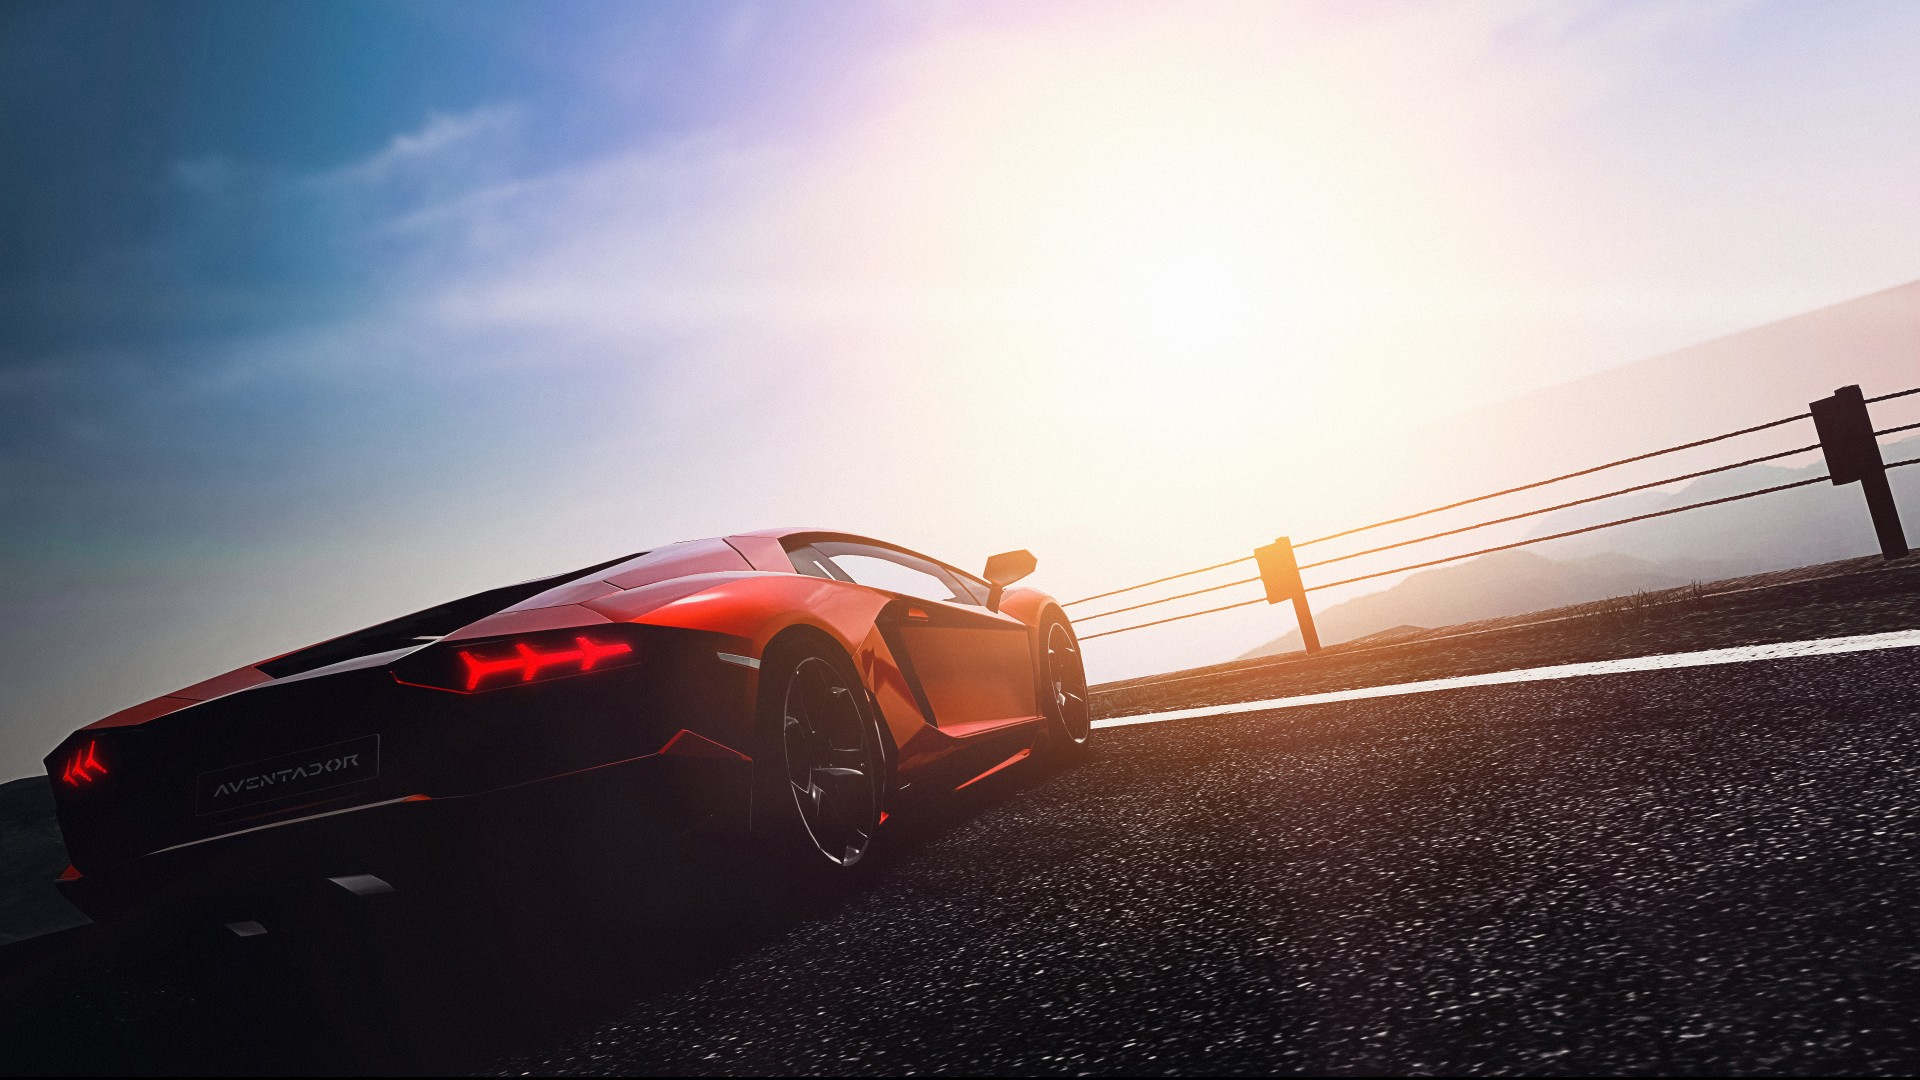 Lamborghini Aventador LP 700 4 Gran Turismo 6 2 Wallpaper ...